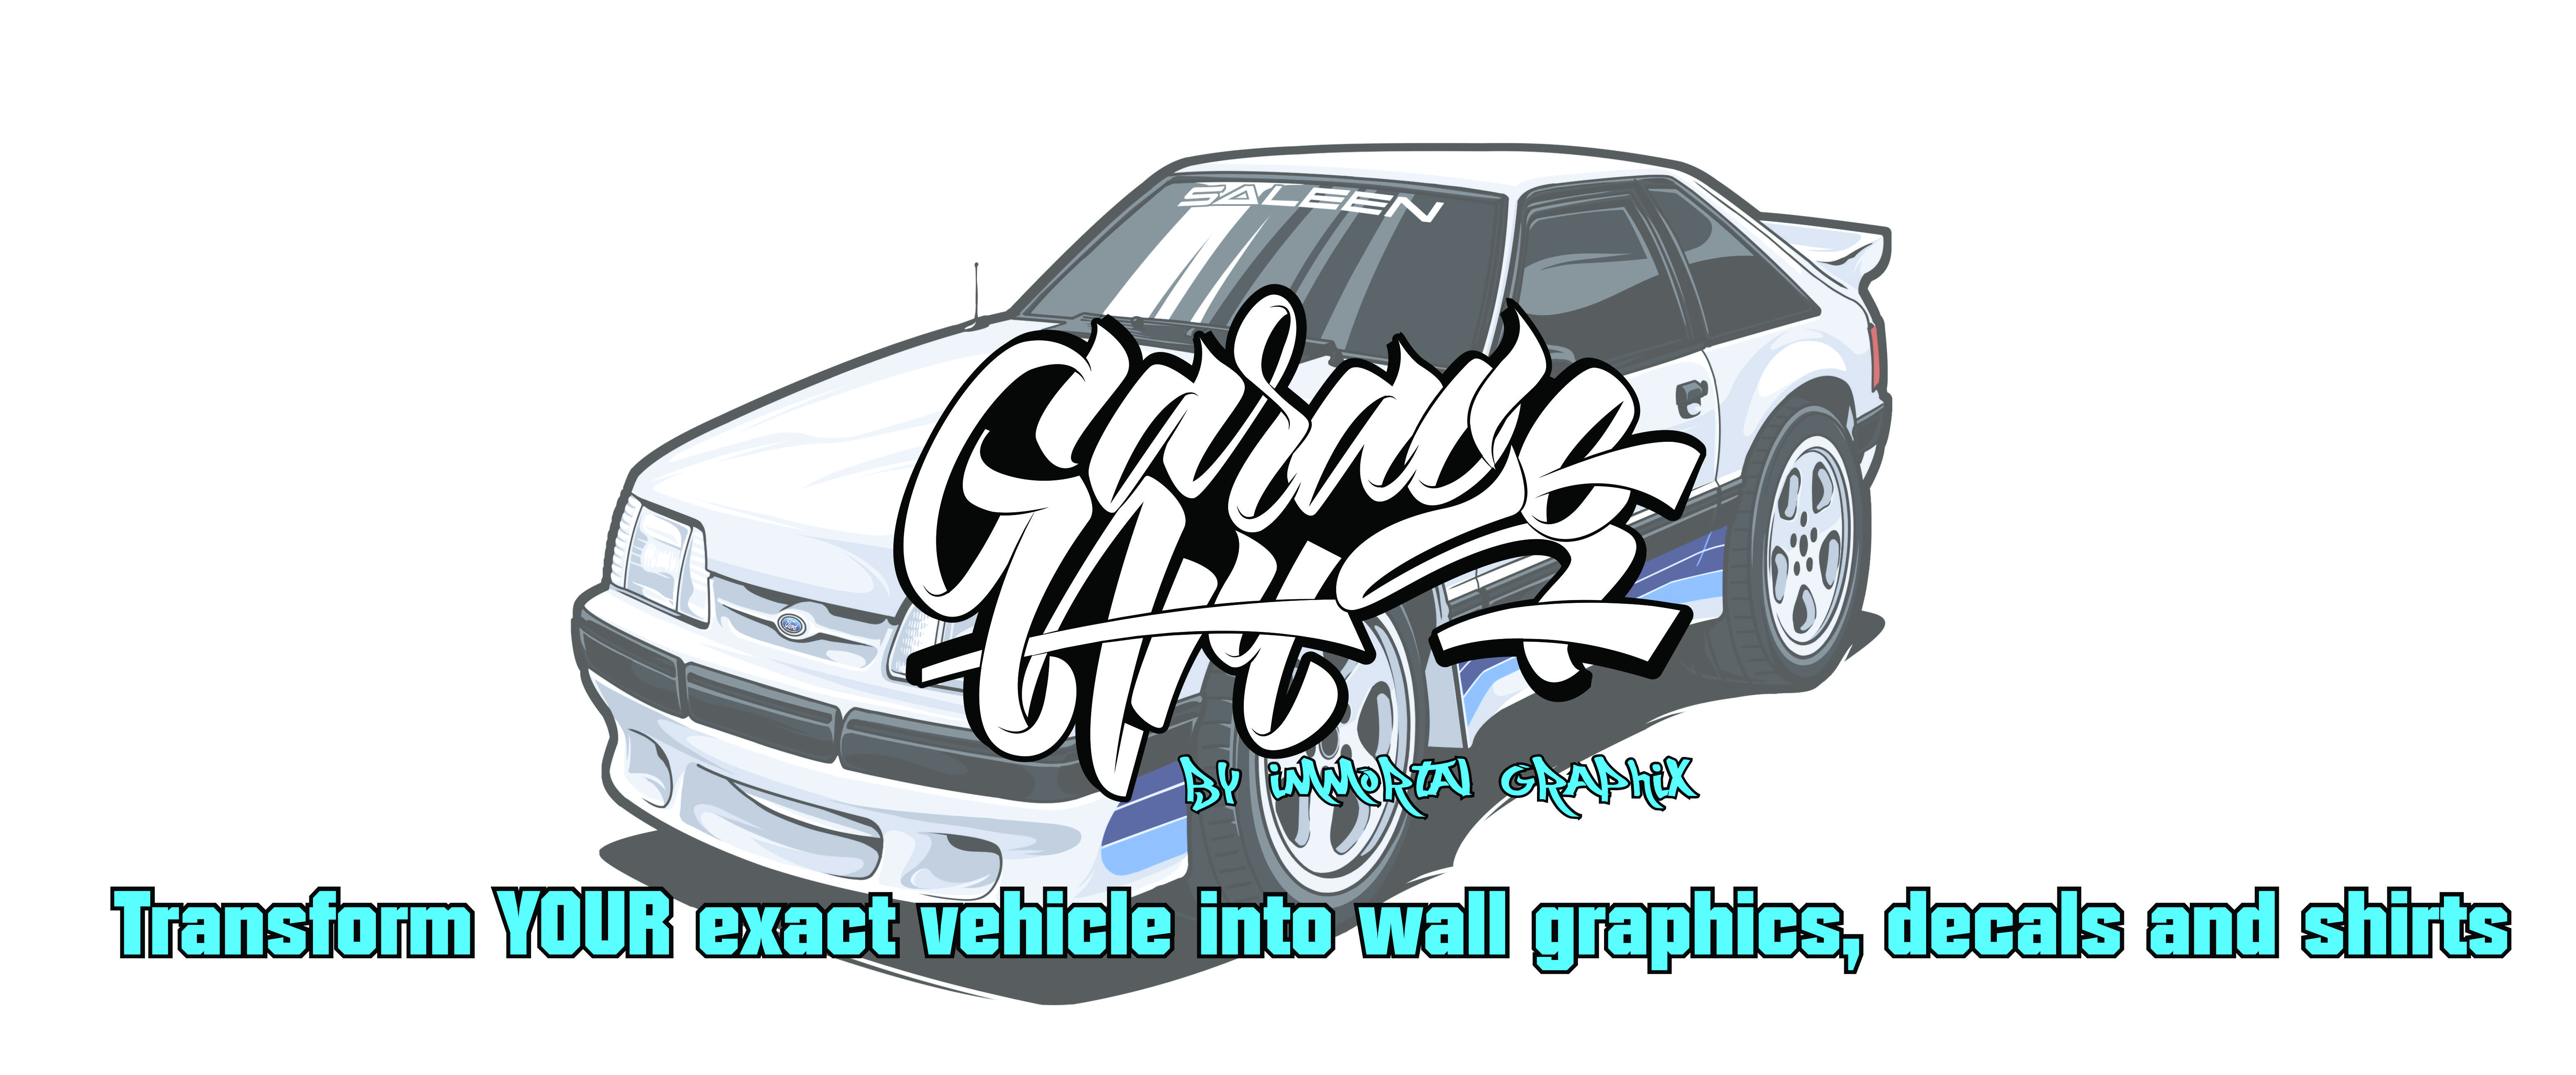 garage-art-facebook.jpg